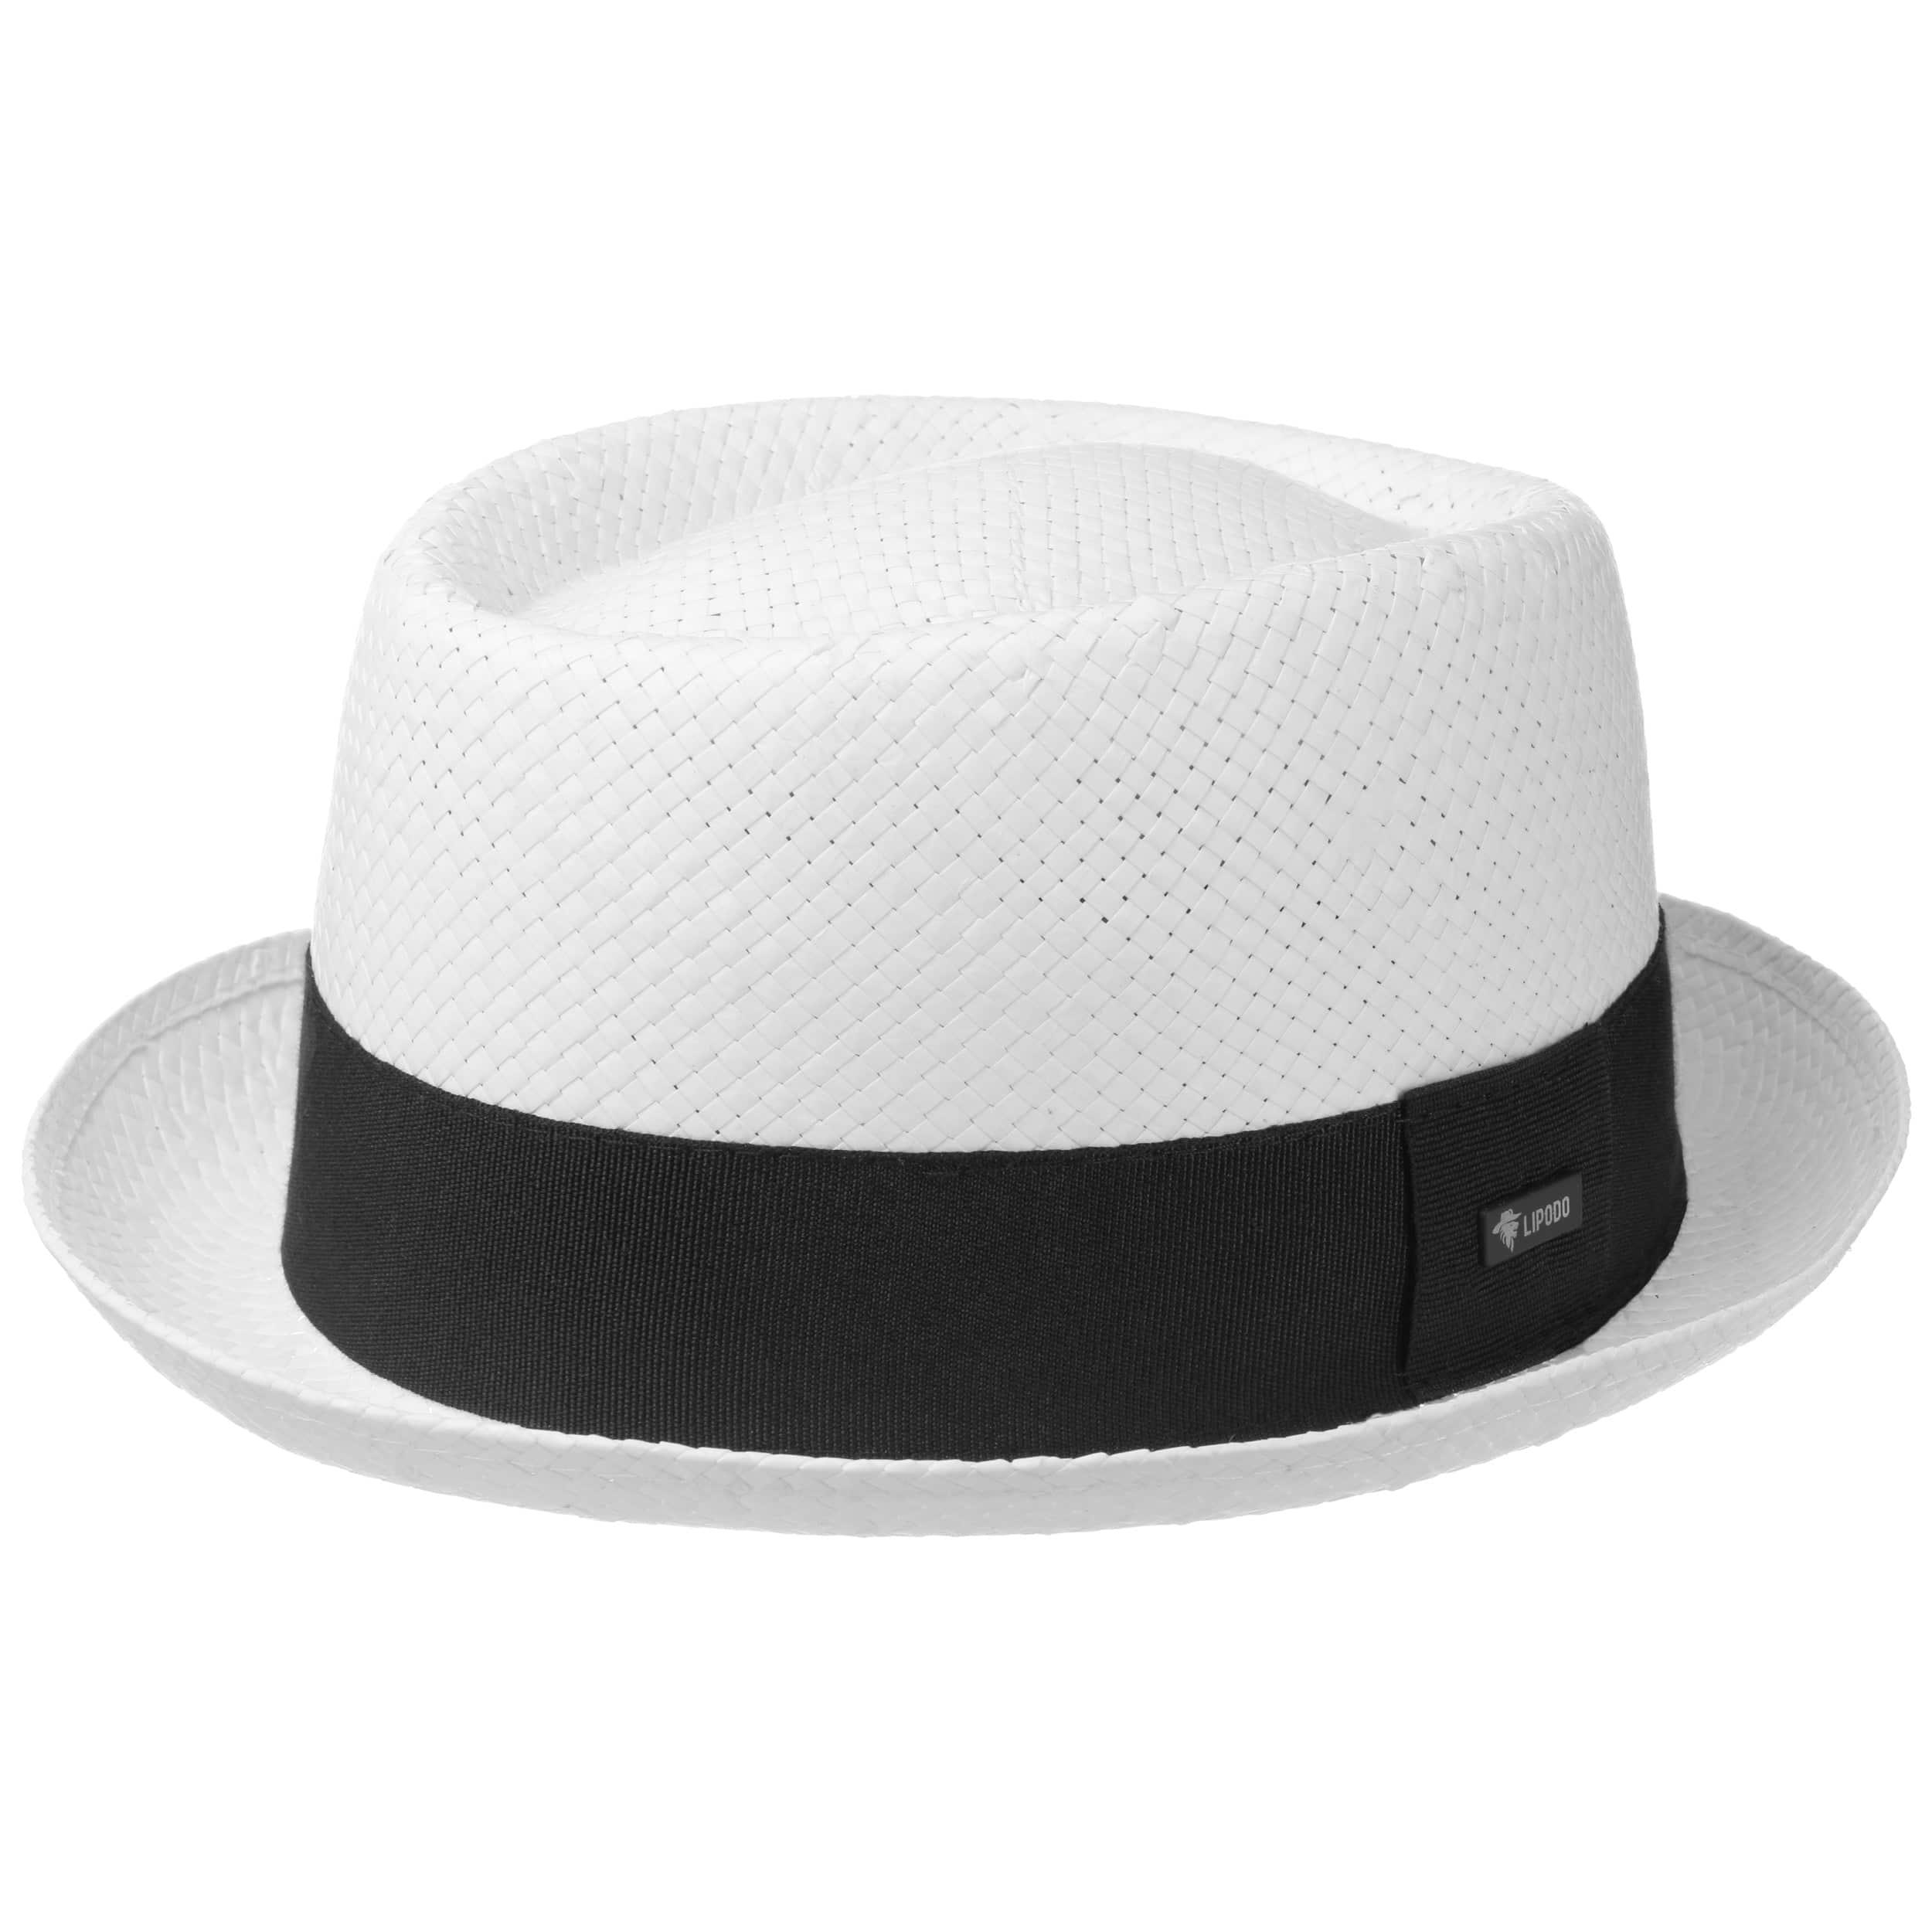 aa266c867fc Acapulco White Pork Pie Hat. by Lipodo